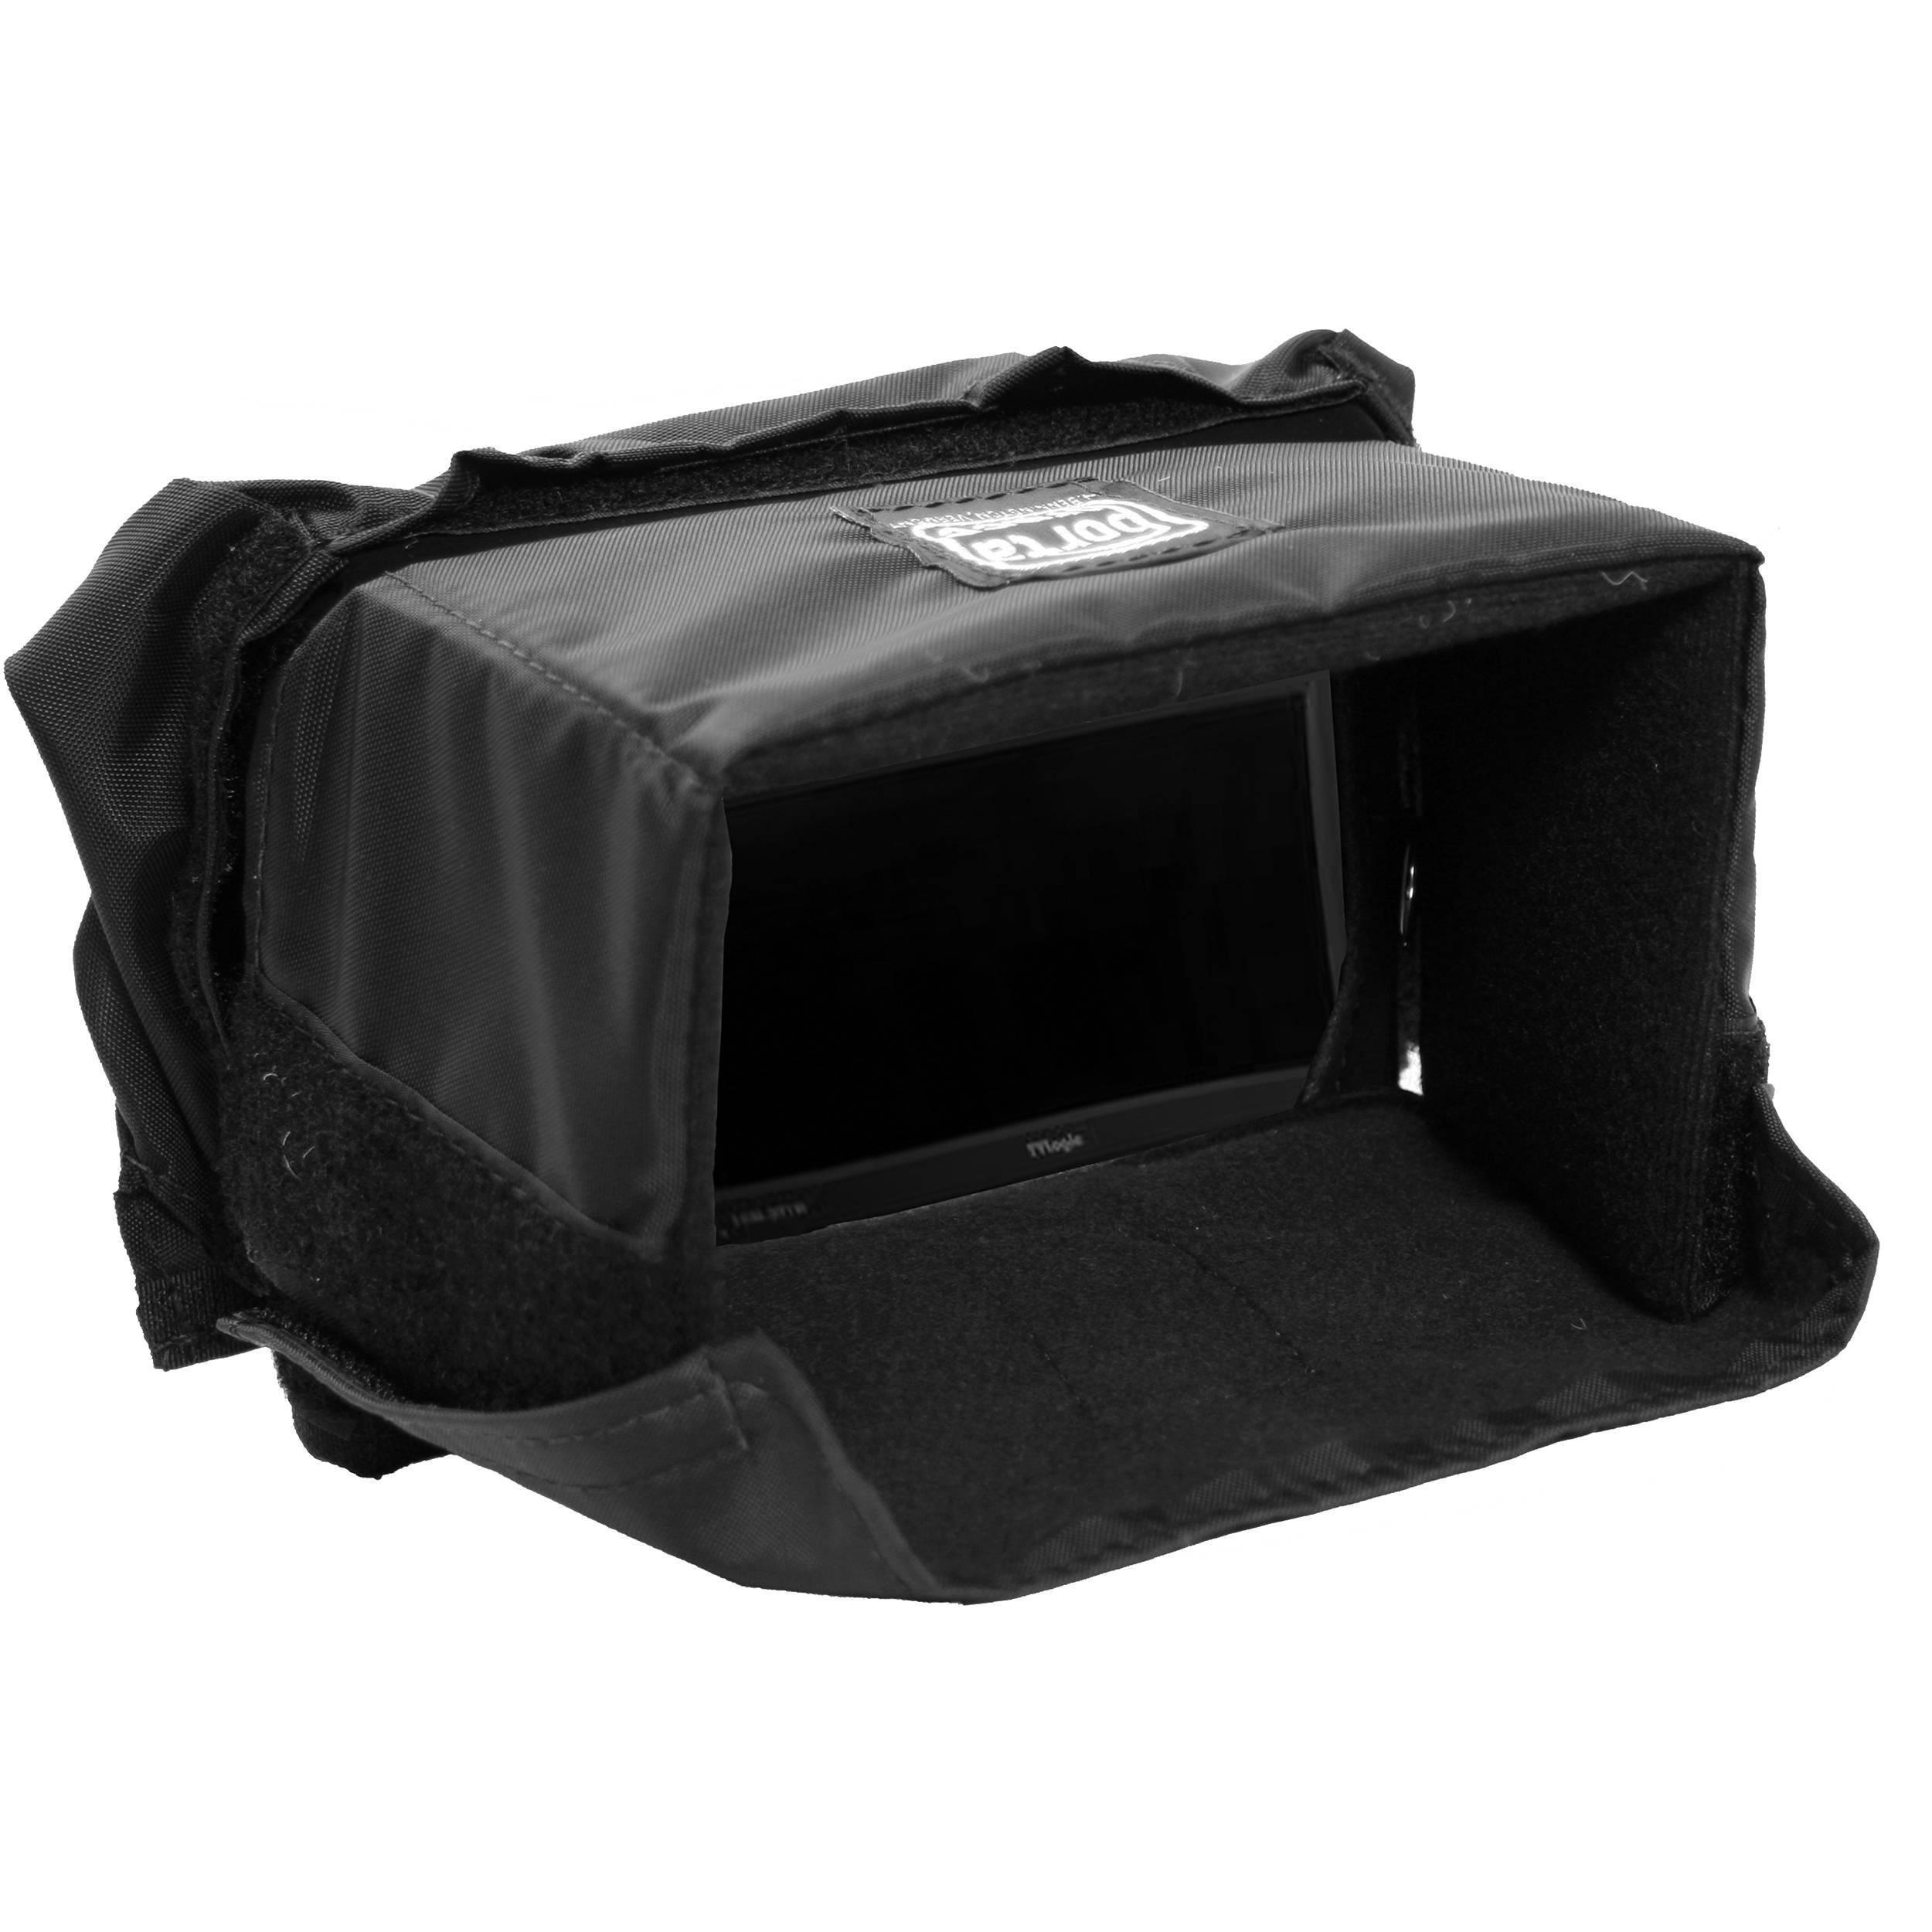 Porta Tv Flat.Porta Brace Flat Screen Field Monitor Case For The Mo Vfm 058 And Tv Logic Vfm 058w